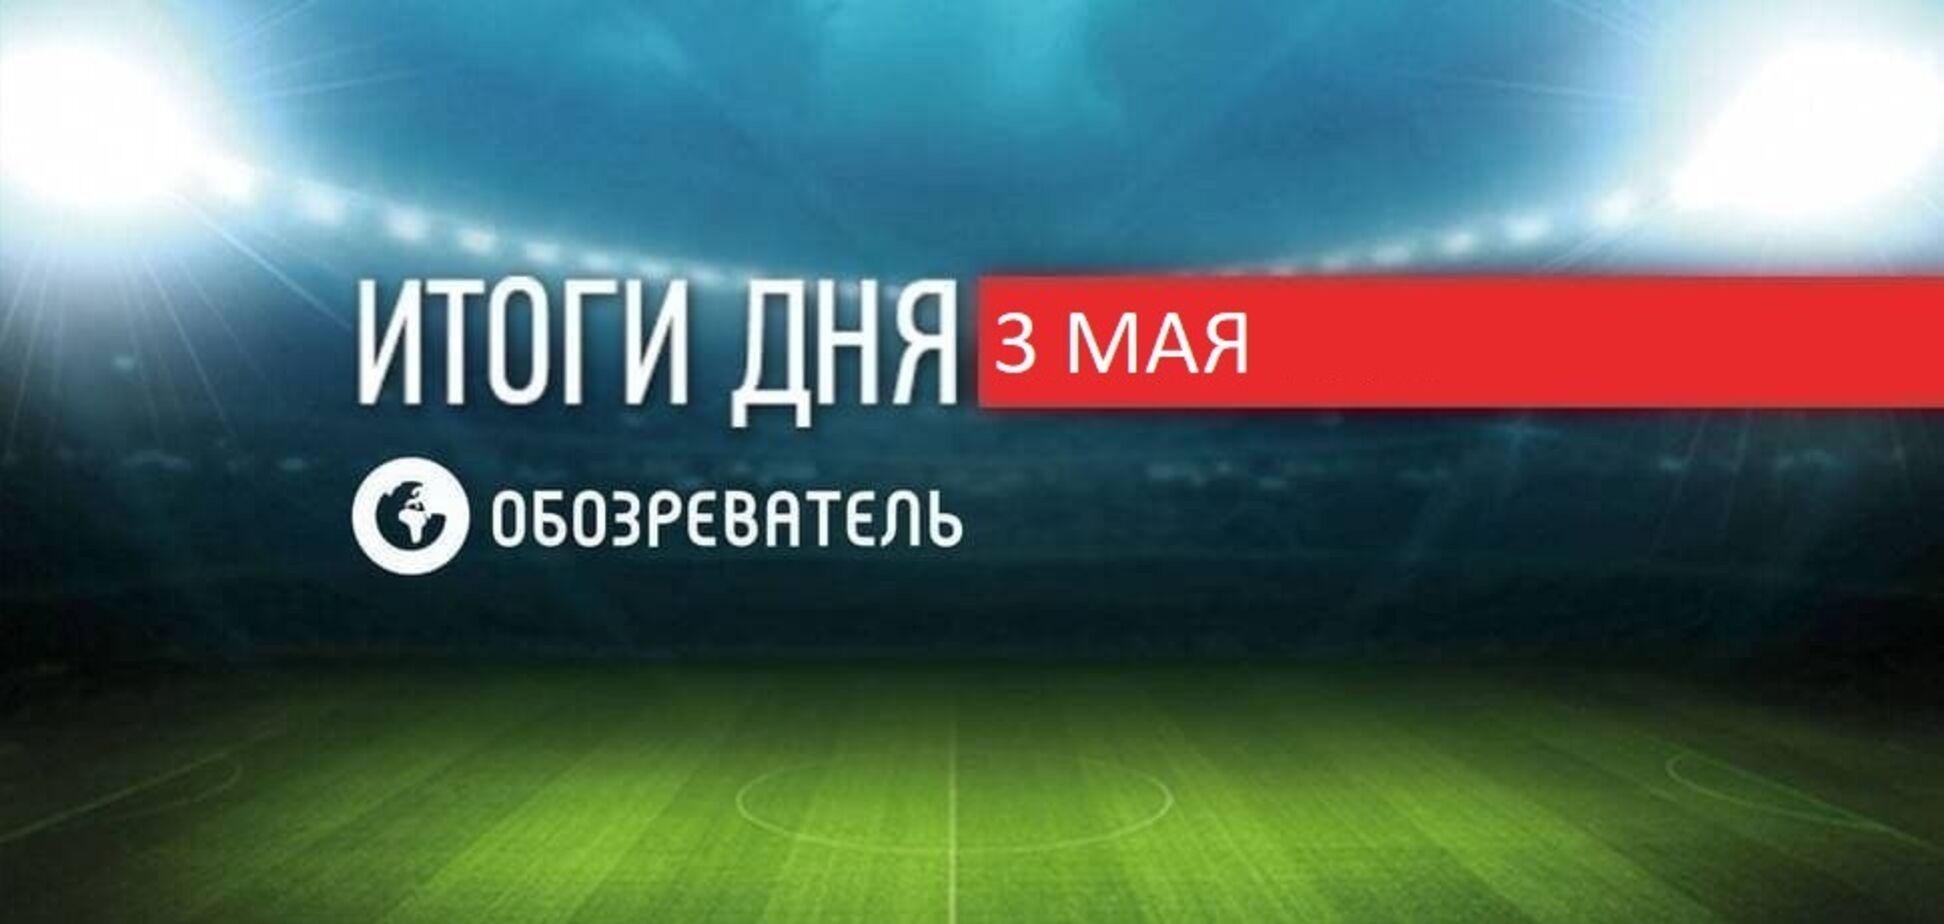 Новини спорта 3 травня: Шевченко хоче залишити збірну України